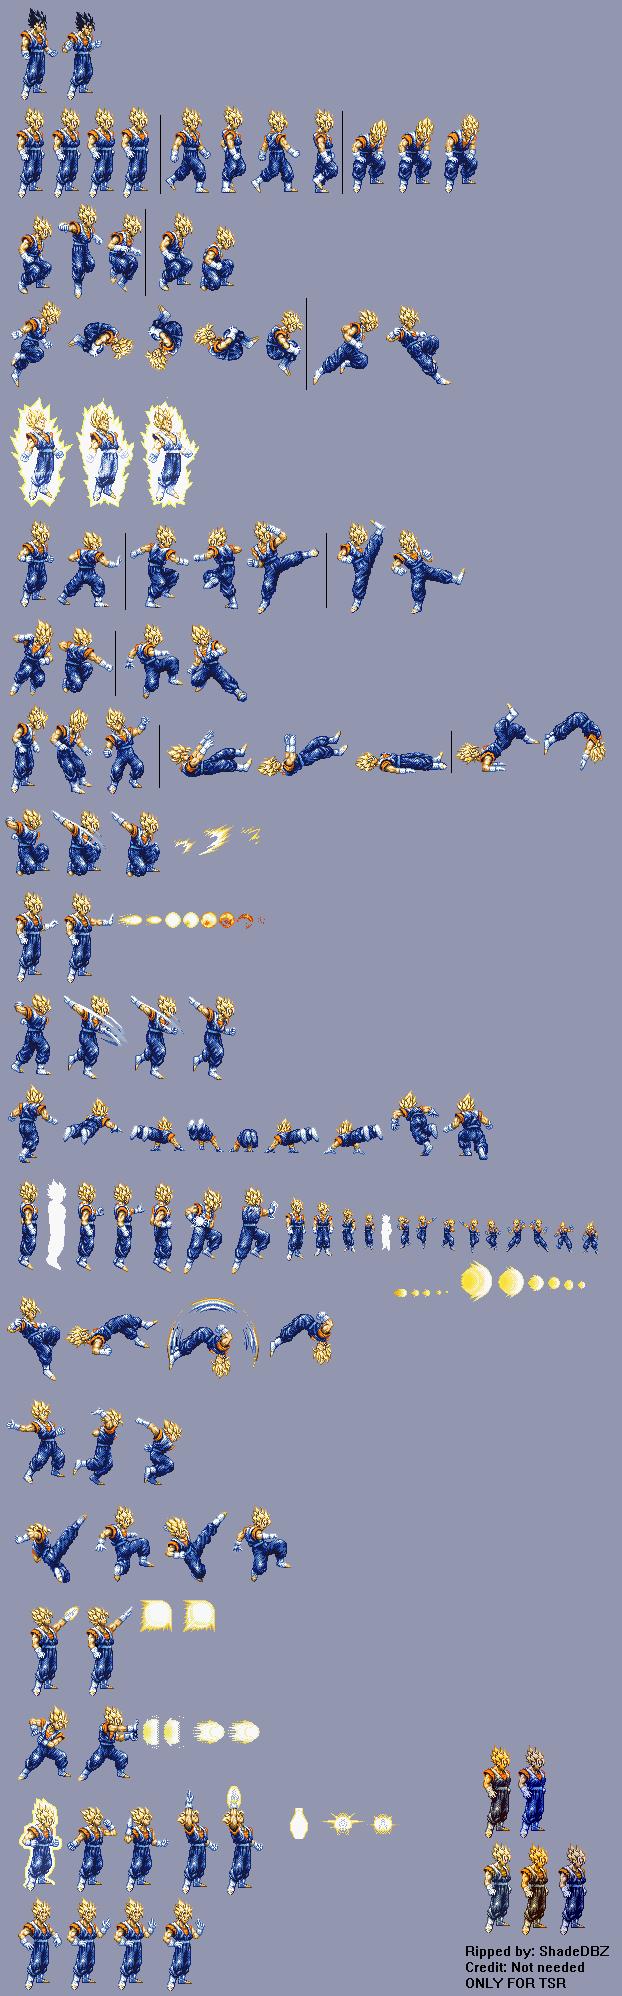 SNES - Drago... Dragon Ball Z Hyper Dimension Sprites